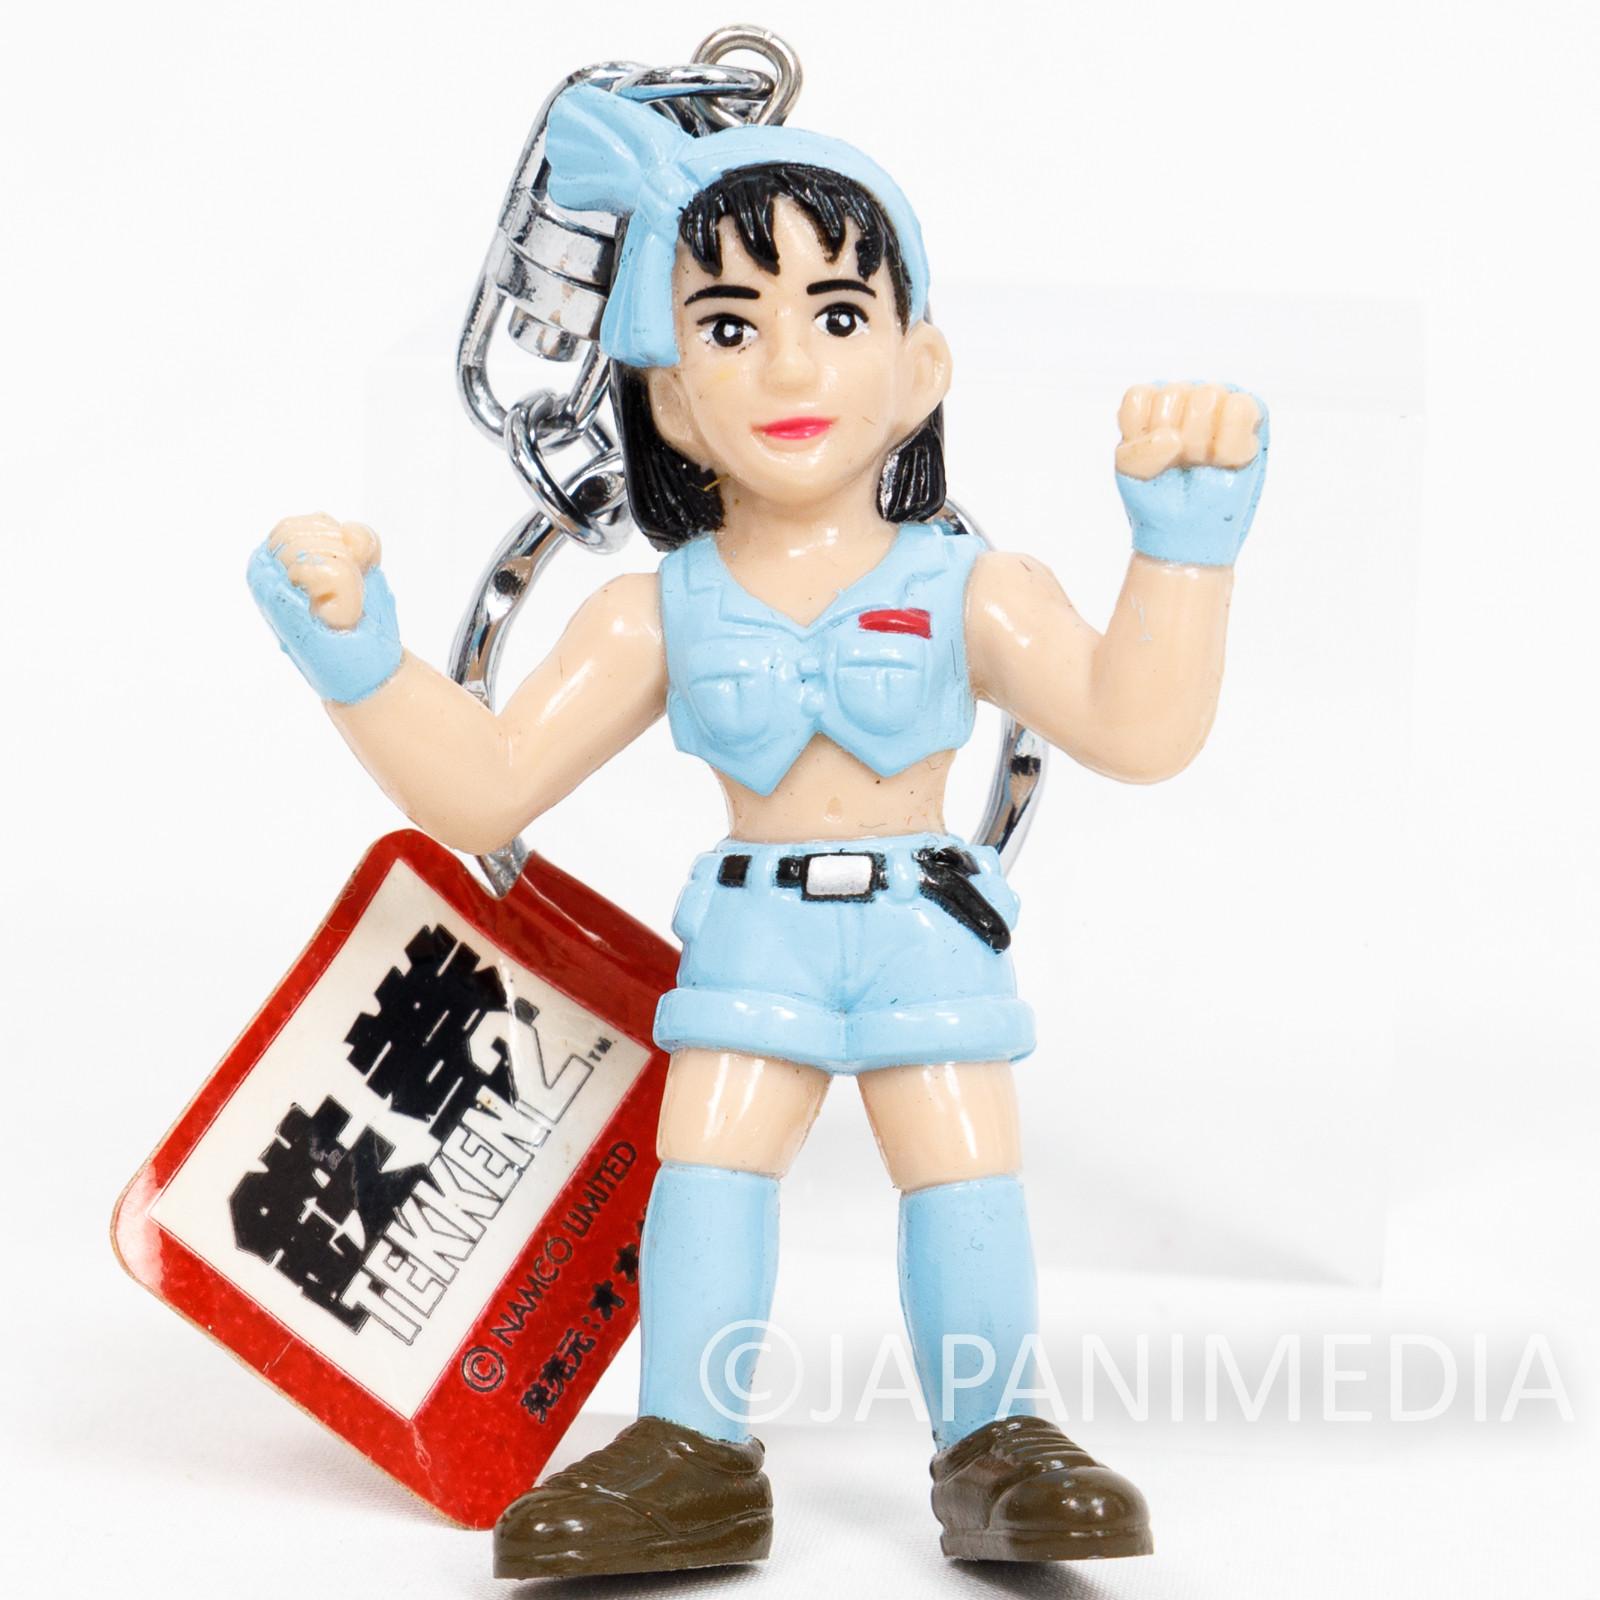 Retro RARE! Tekken Jun Kazama Figure Keychain Namco JAPAN GAME